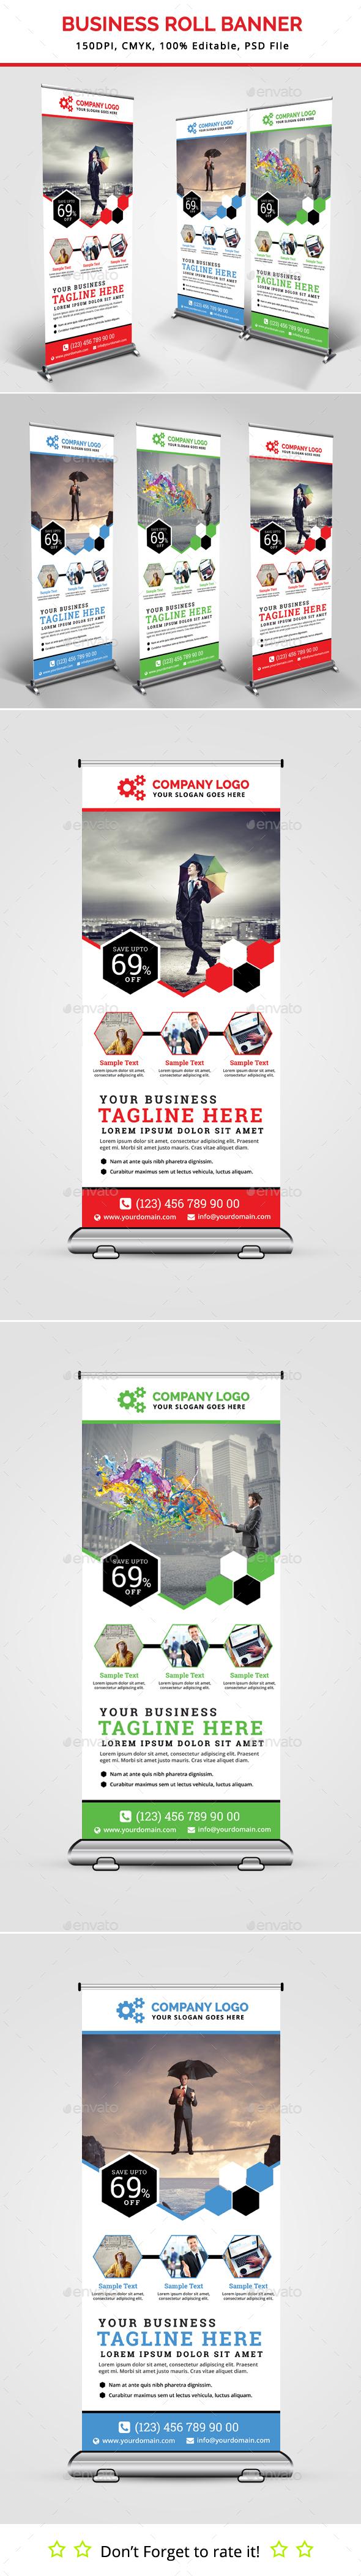 Business Roll Up Banner V20 - Signage Print Templates